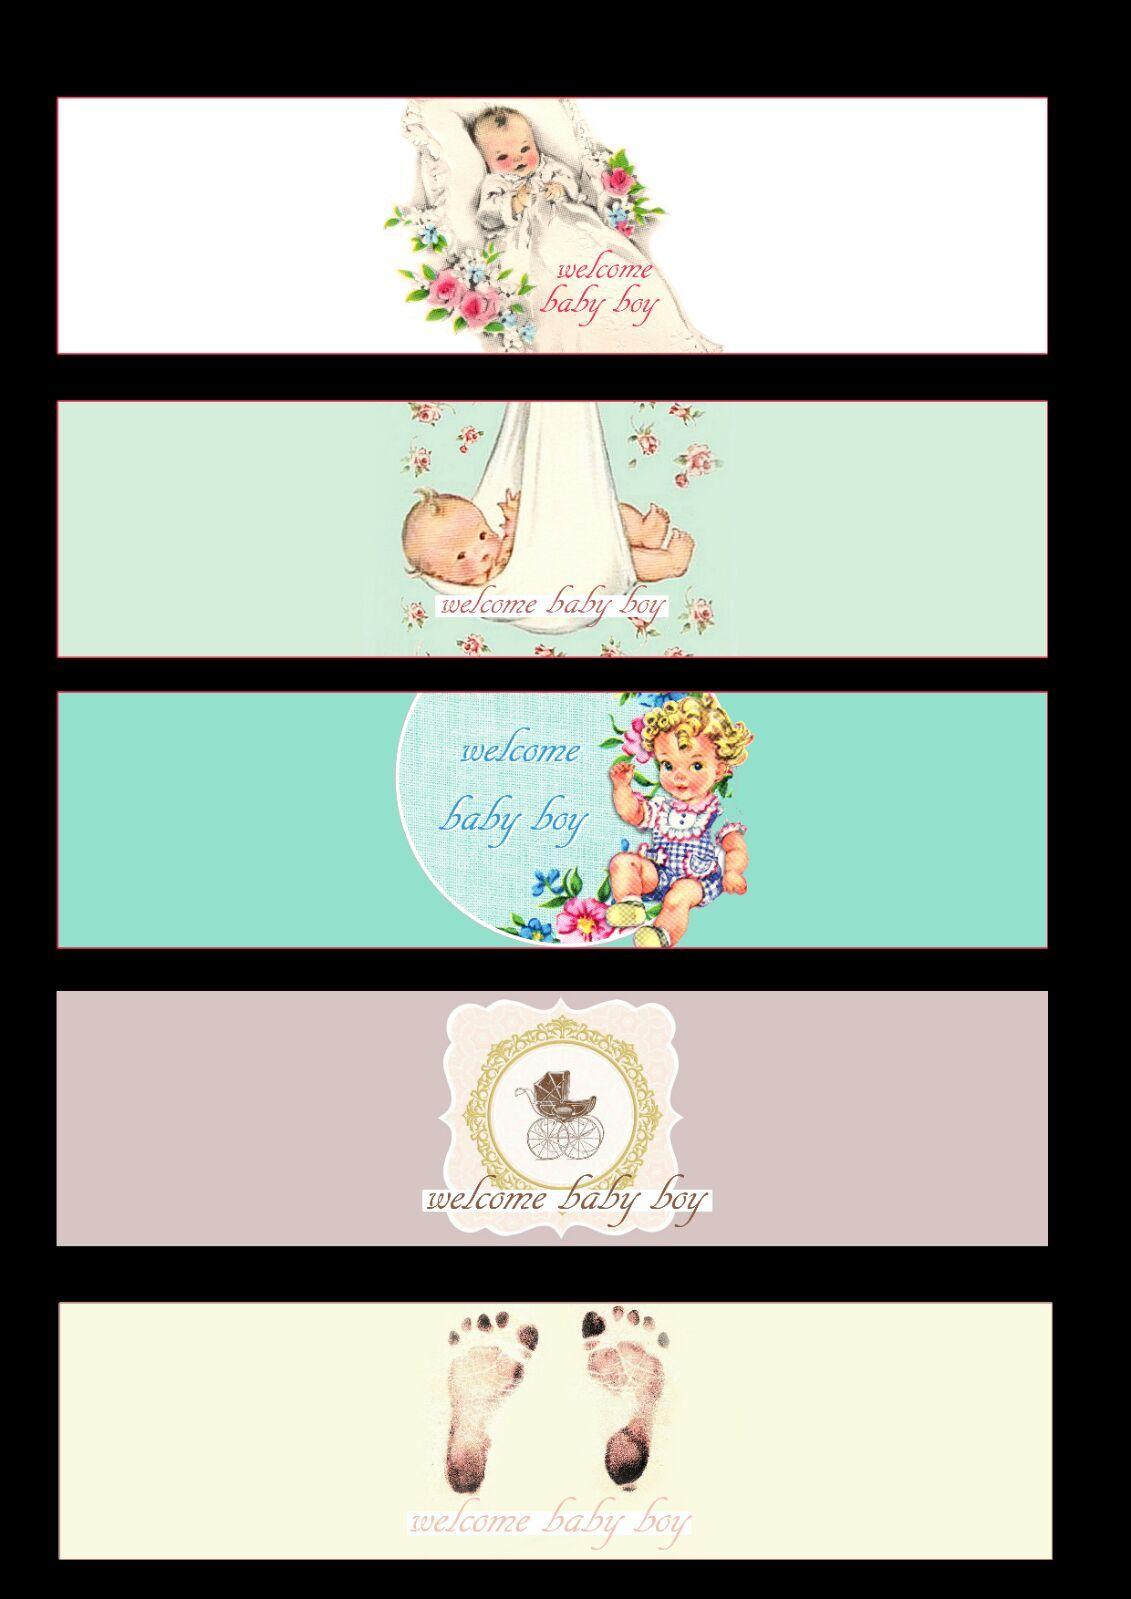 Pin By Hessa Ad On ثيم Diy Birthday Decorations Baby Album Baby Icon